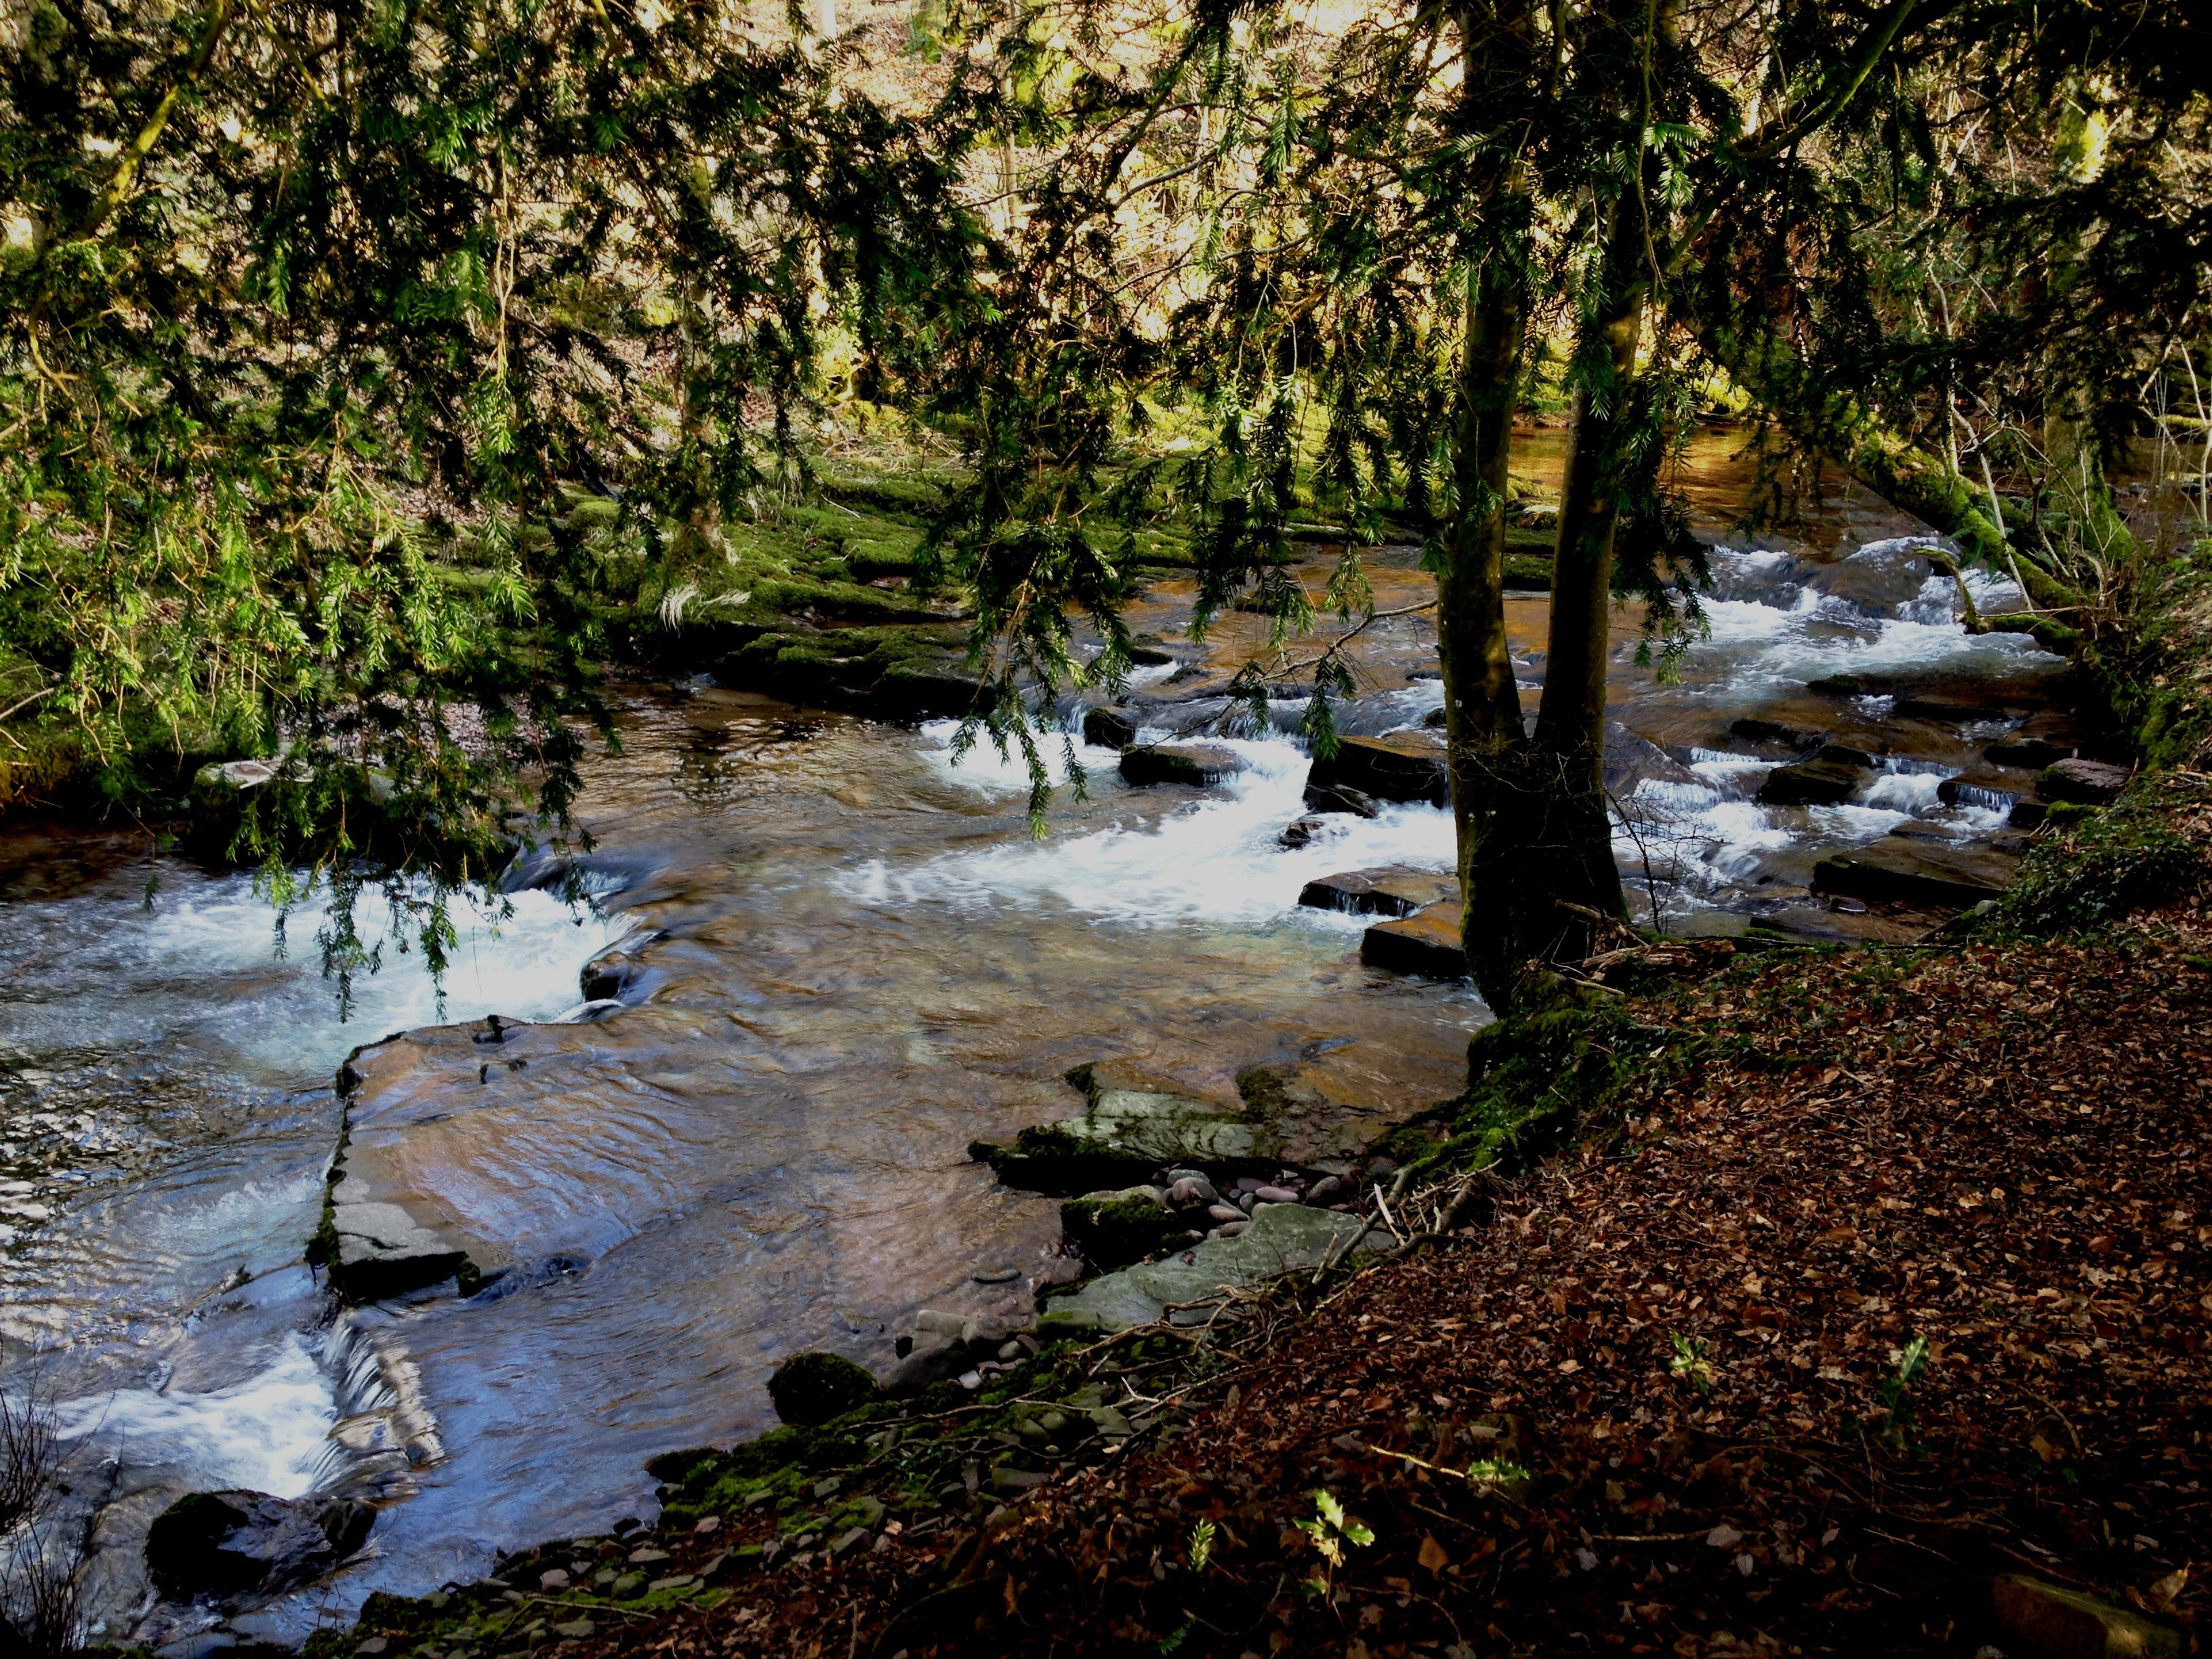 River Cynrig